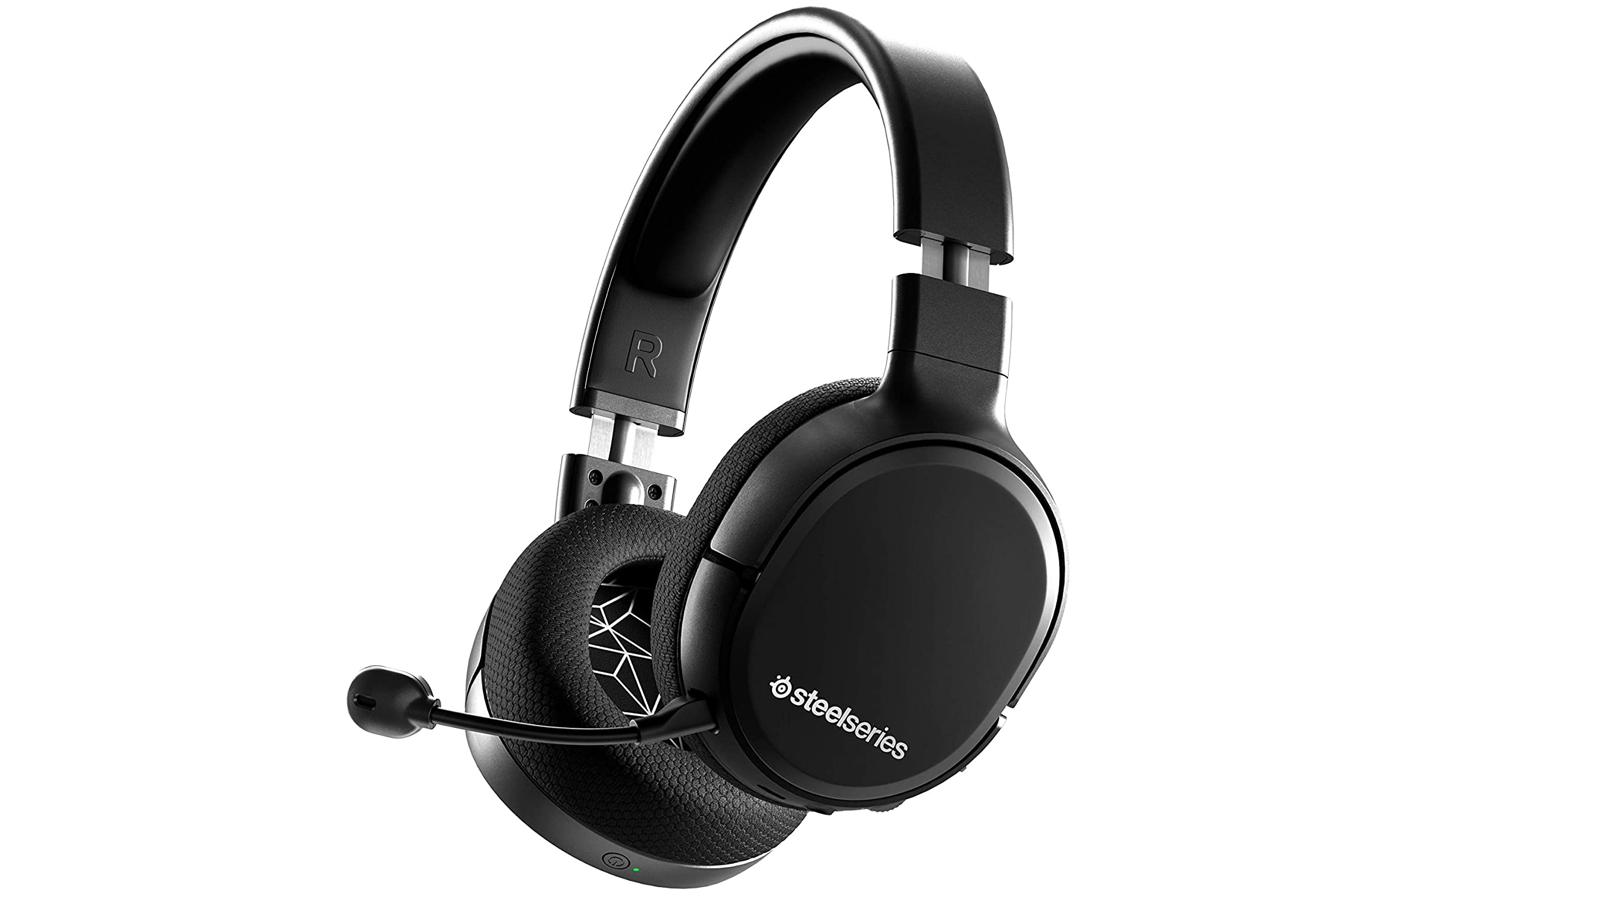 chunky black wireless gaming headset